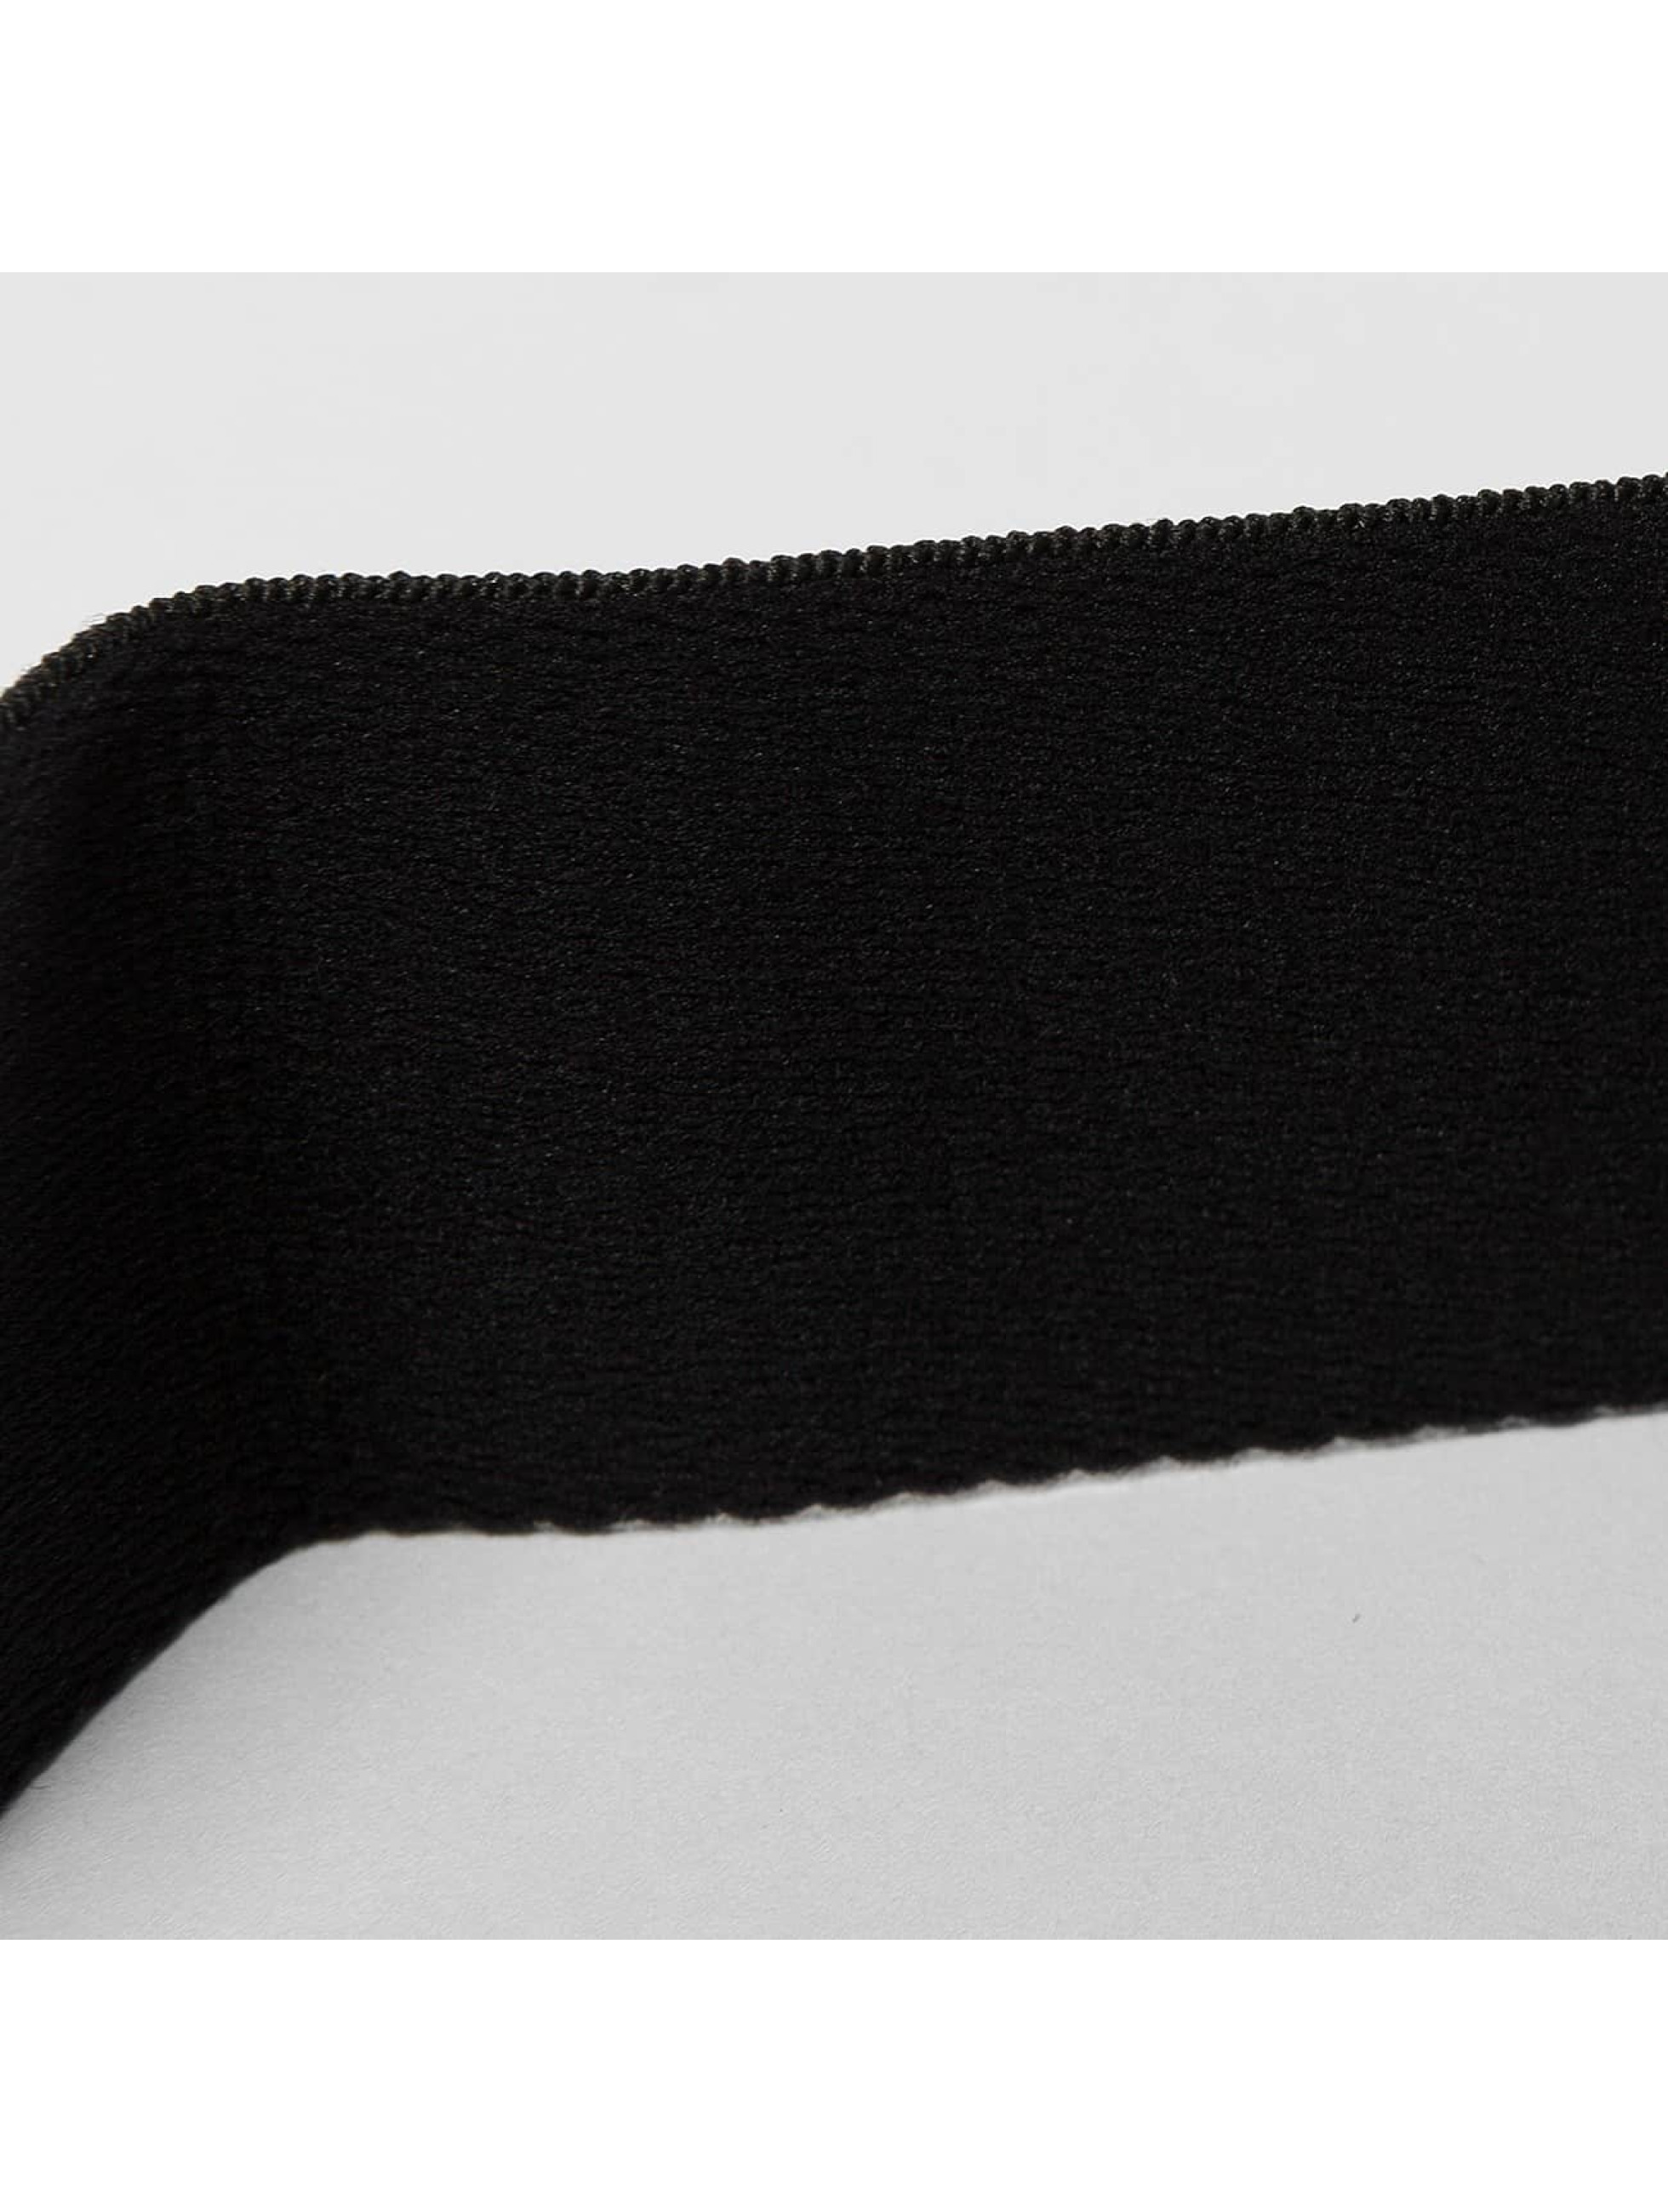 ARCADE Belts Native Collection Sierra Camo kamuflasje